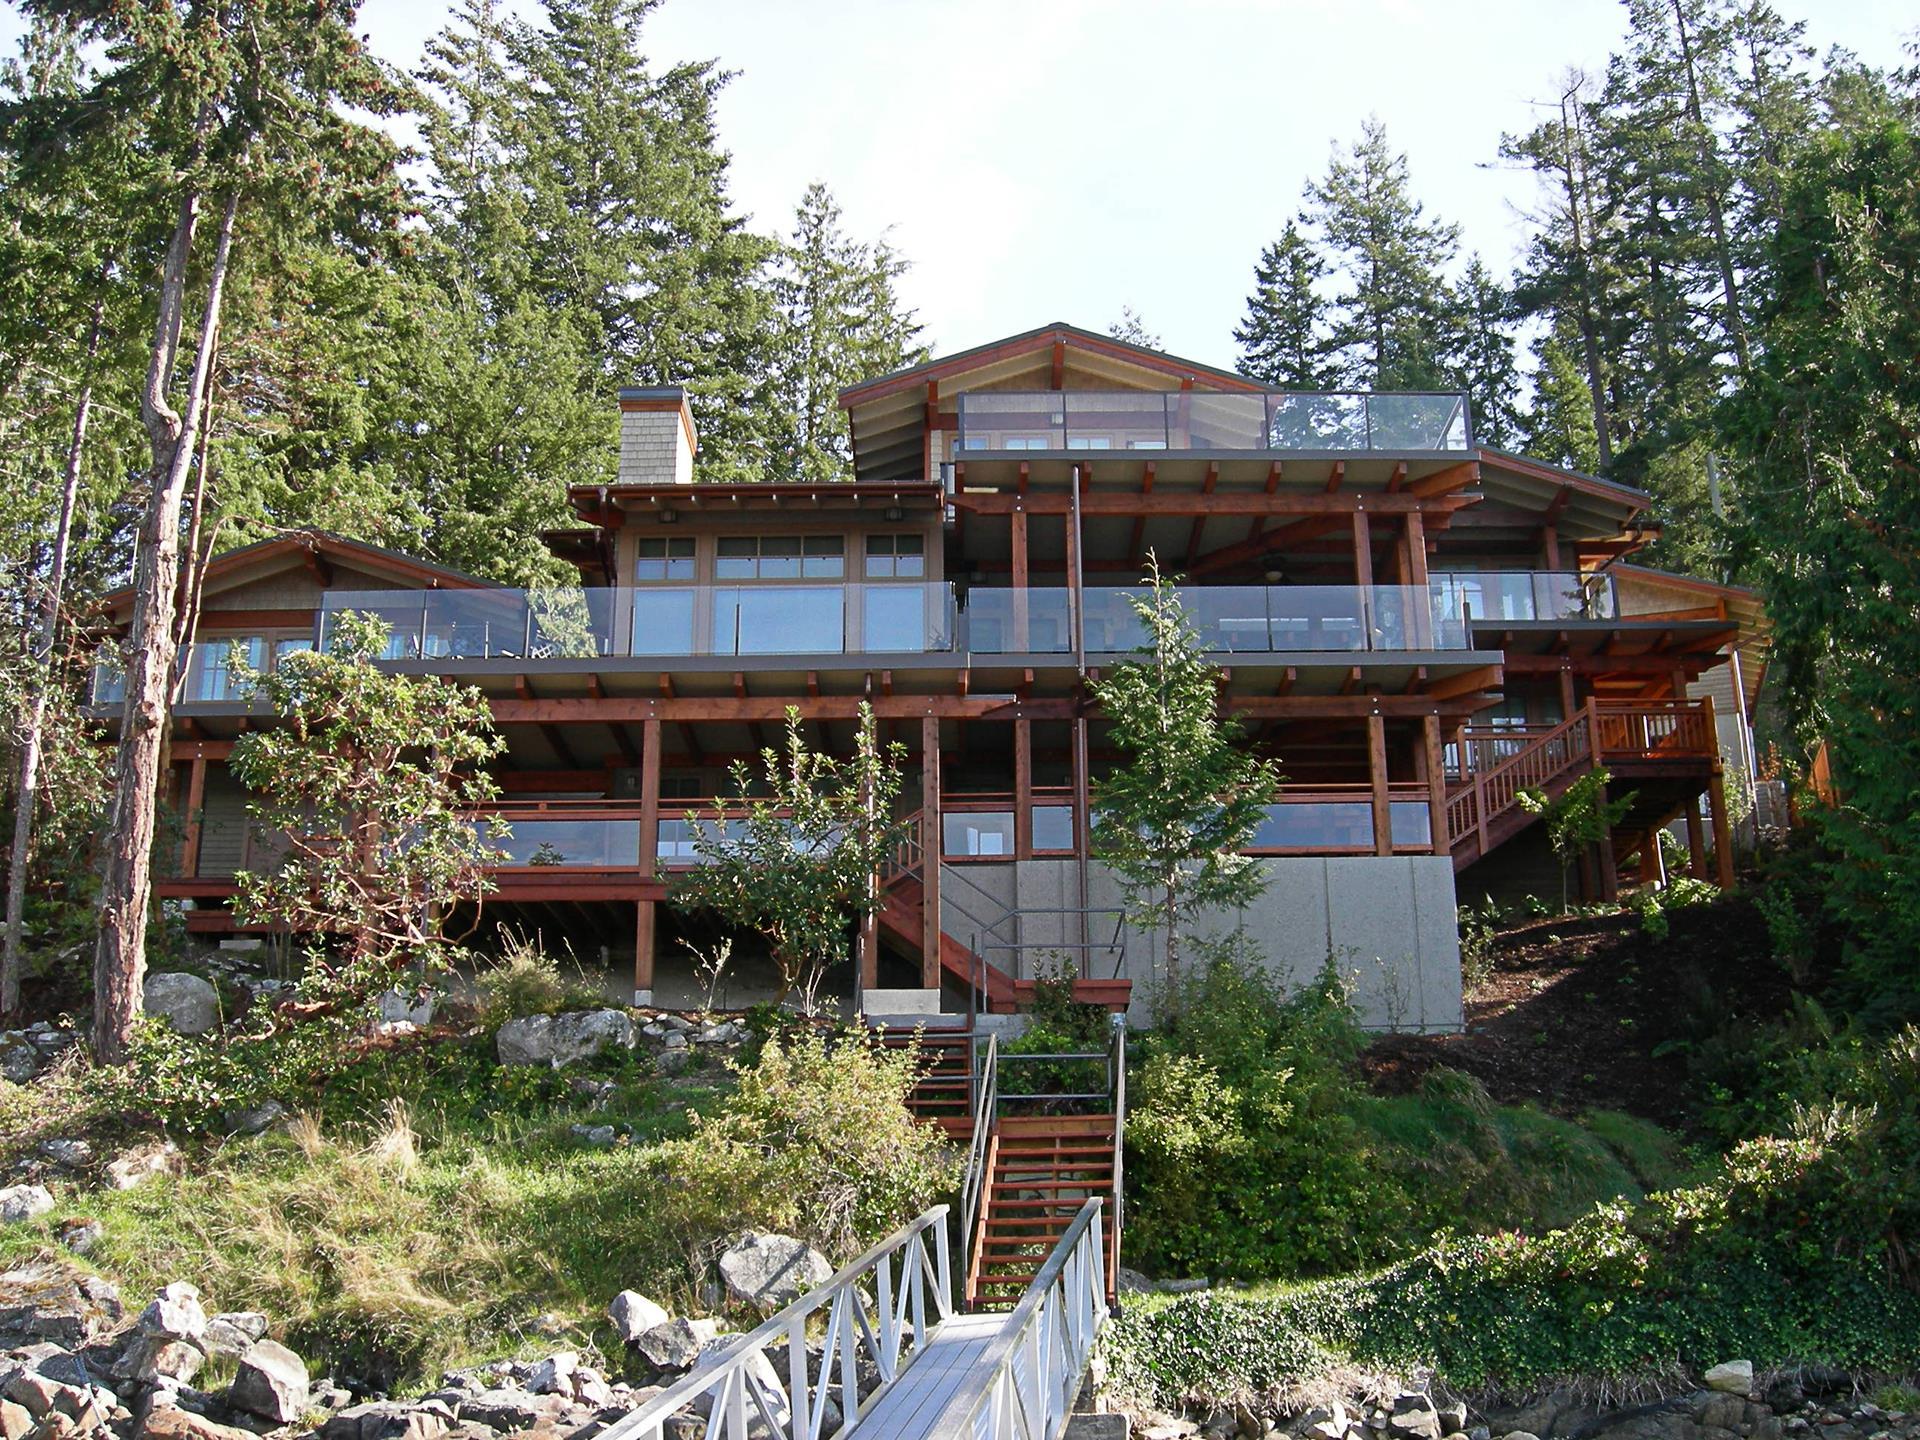 Cottage Plans for Summer Retreat